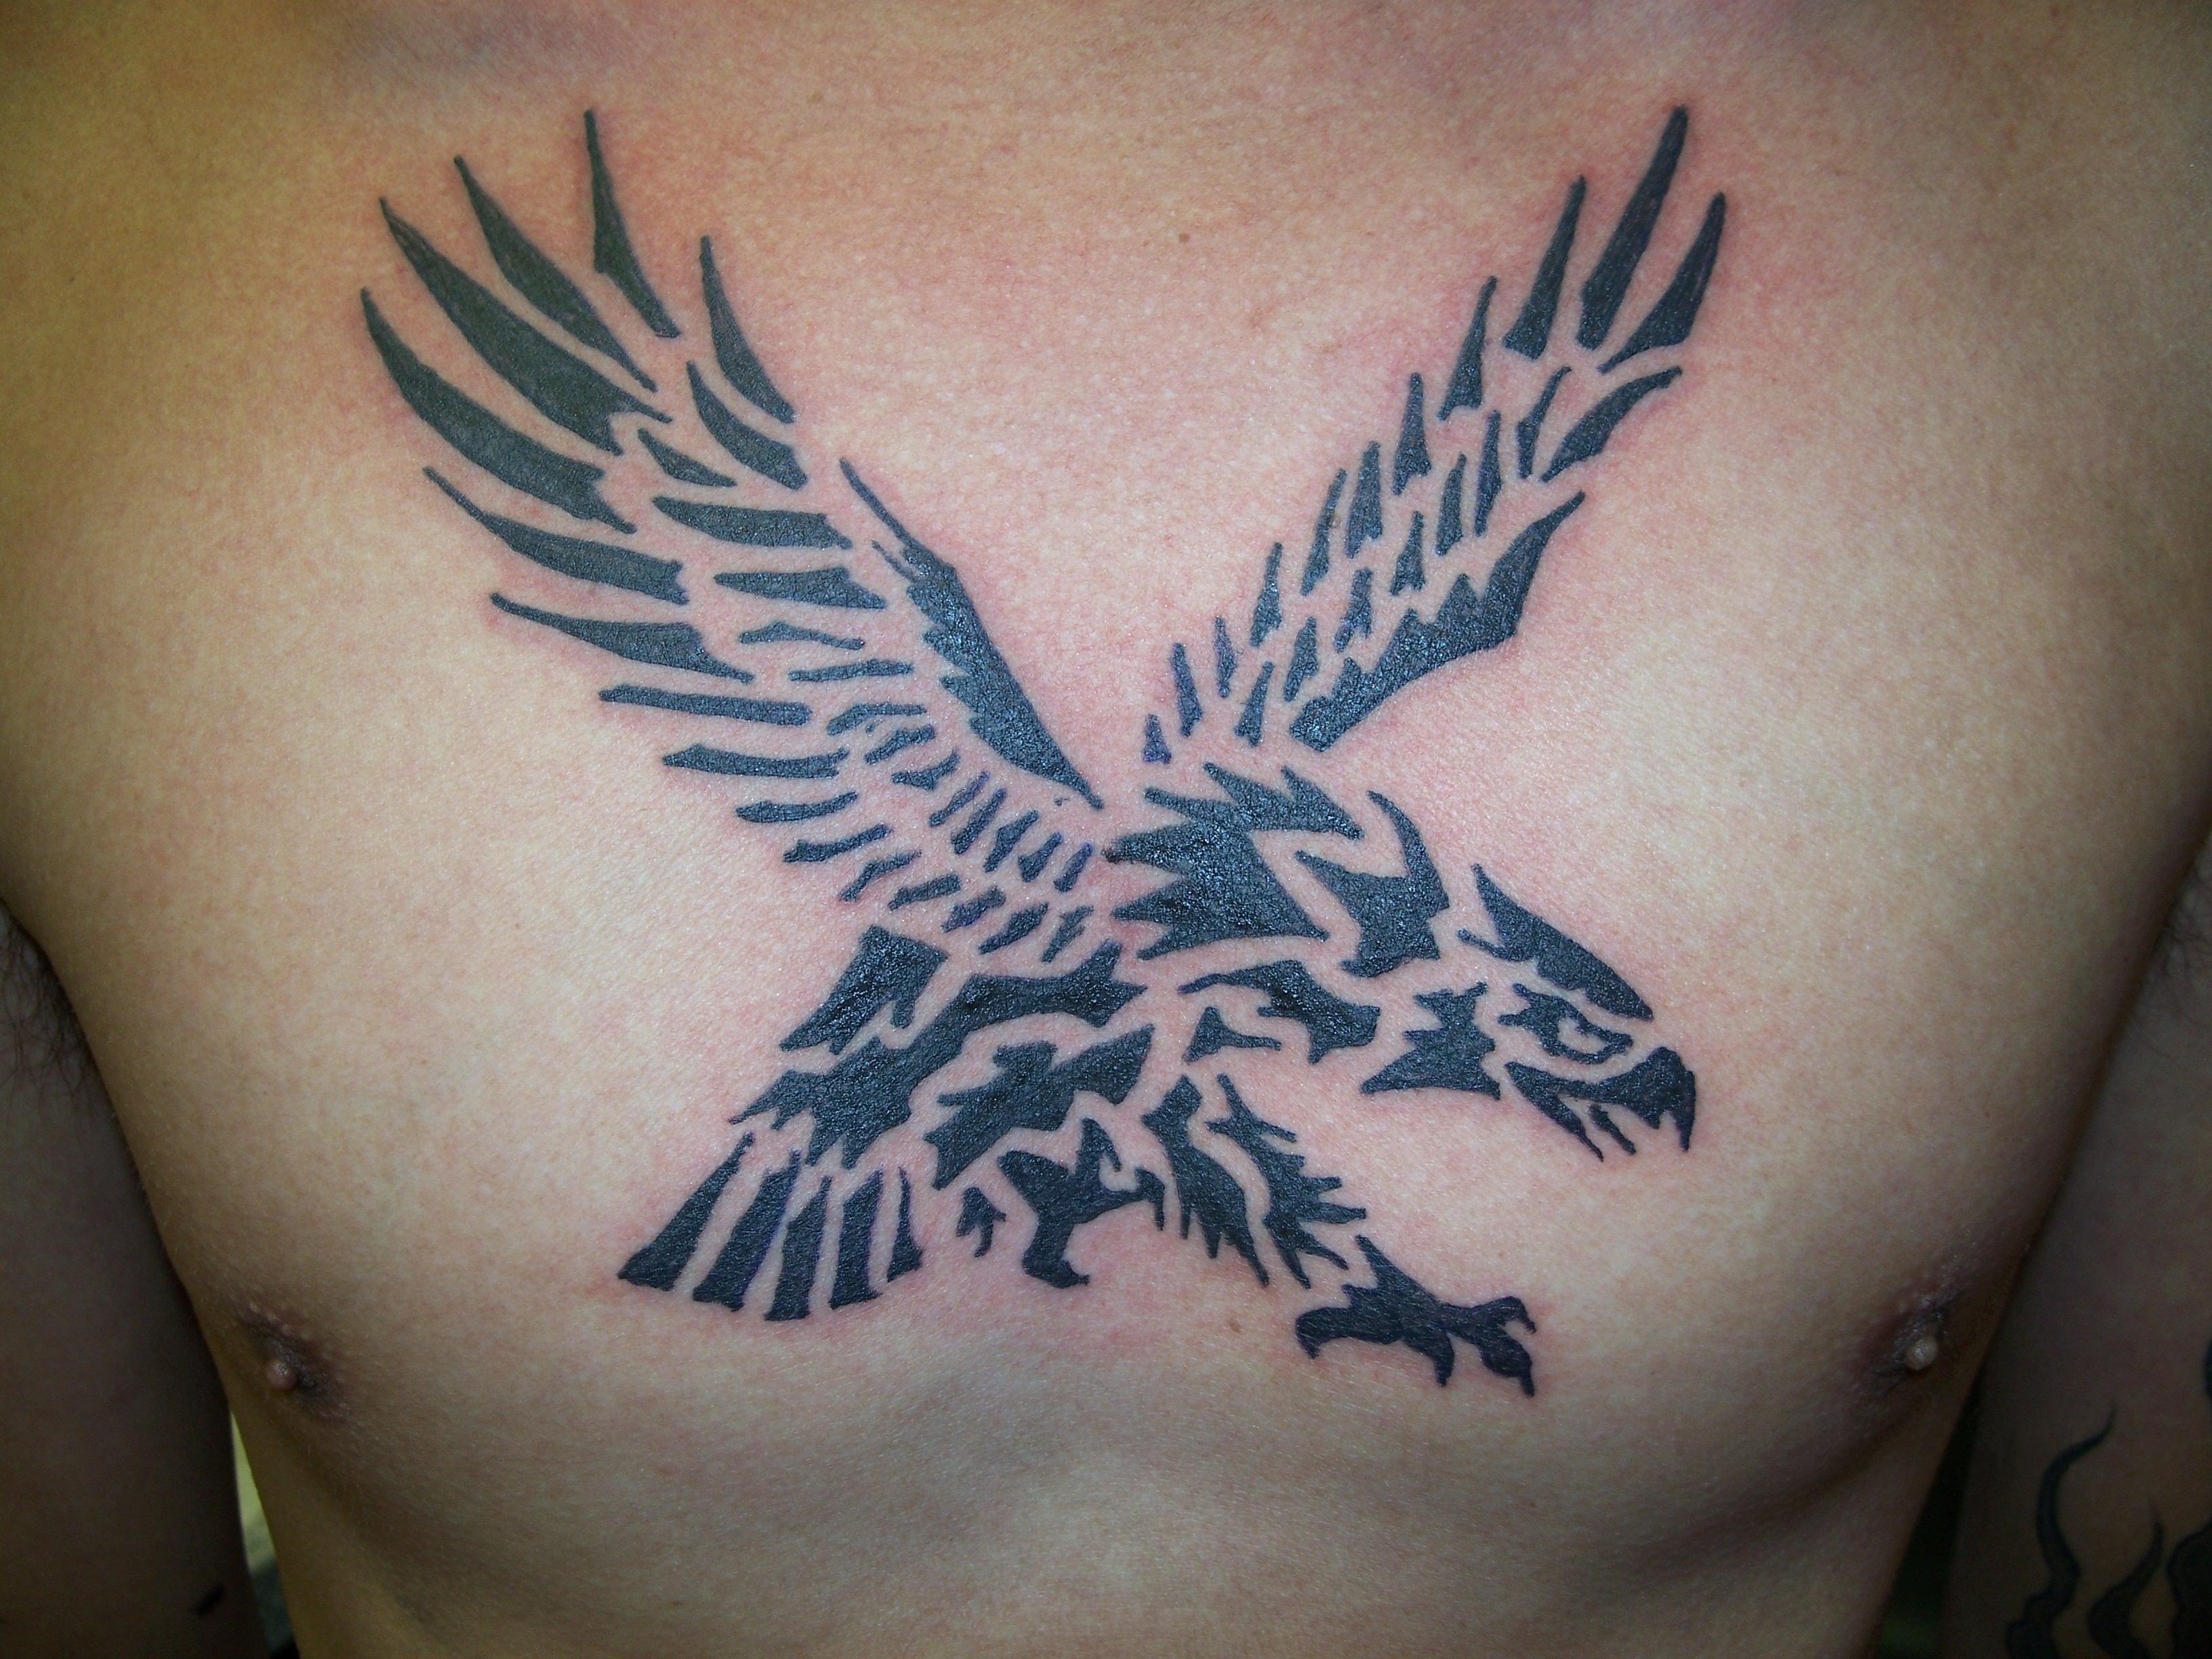 https://i1.wp.com/upload.wikimedia.org/wikipedia/commons/0/06/Tribal_eagle_tattoo_by_Keith_Killingsworth.JPG